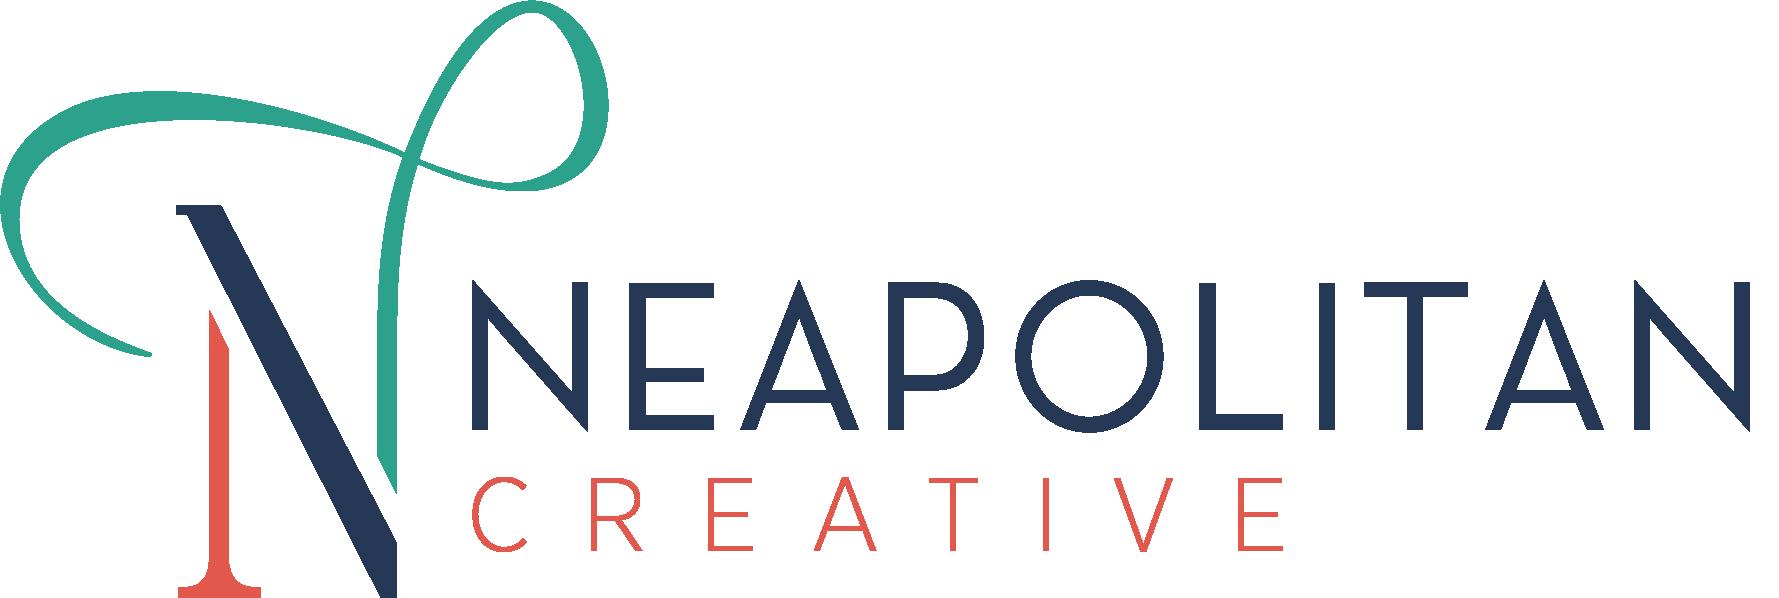 Neapolitan-Creative-Logo